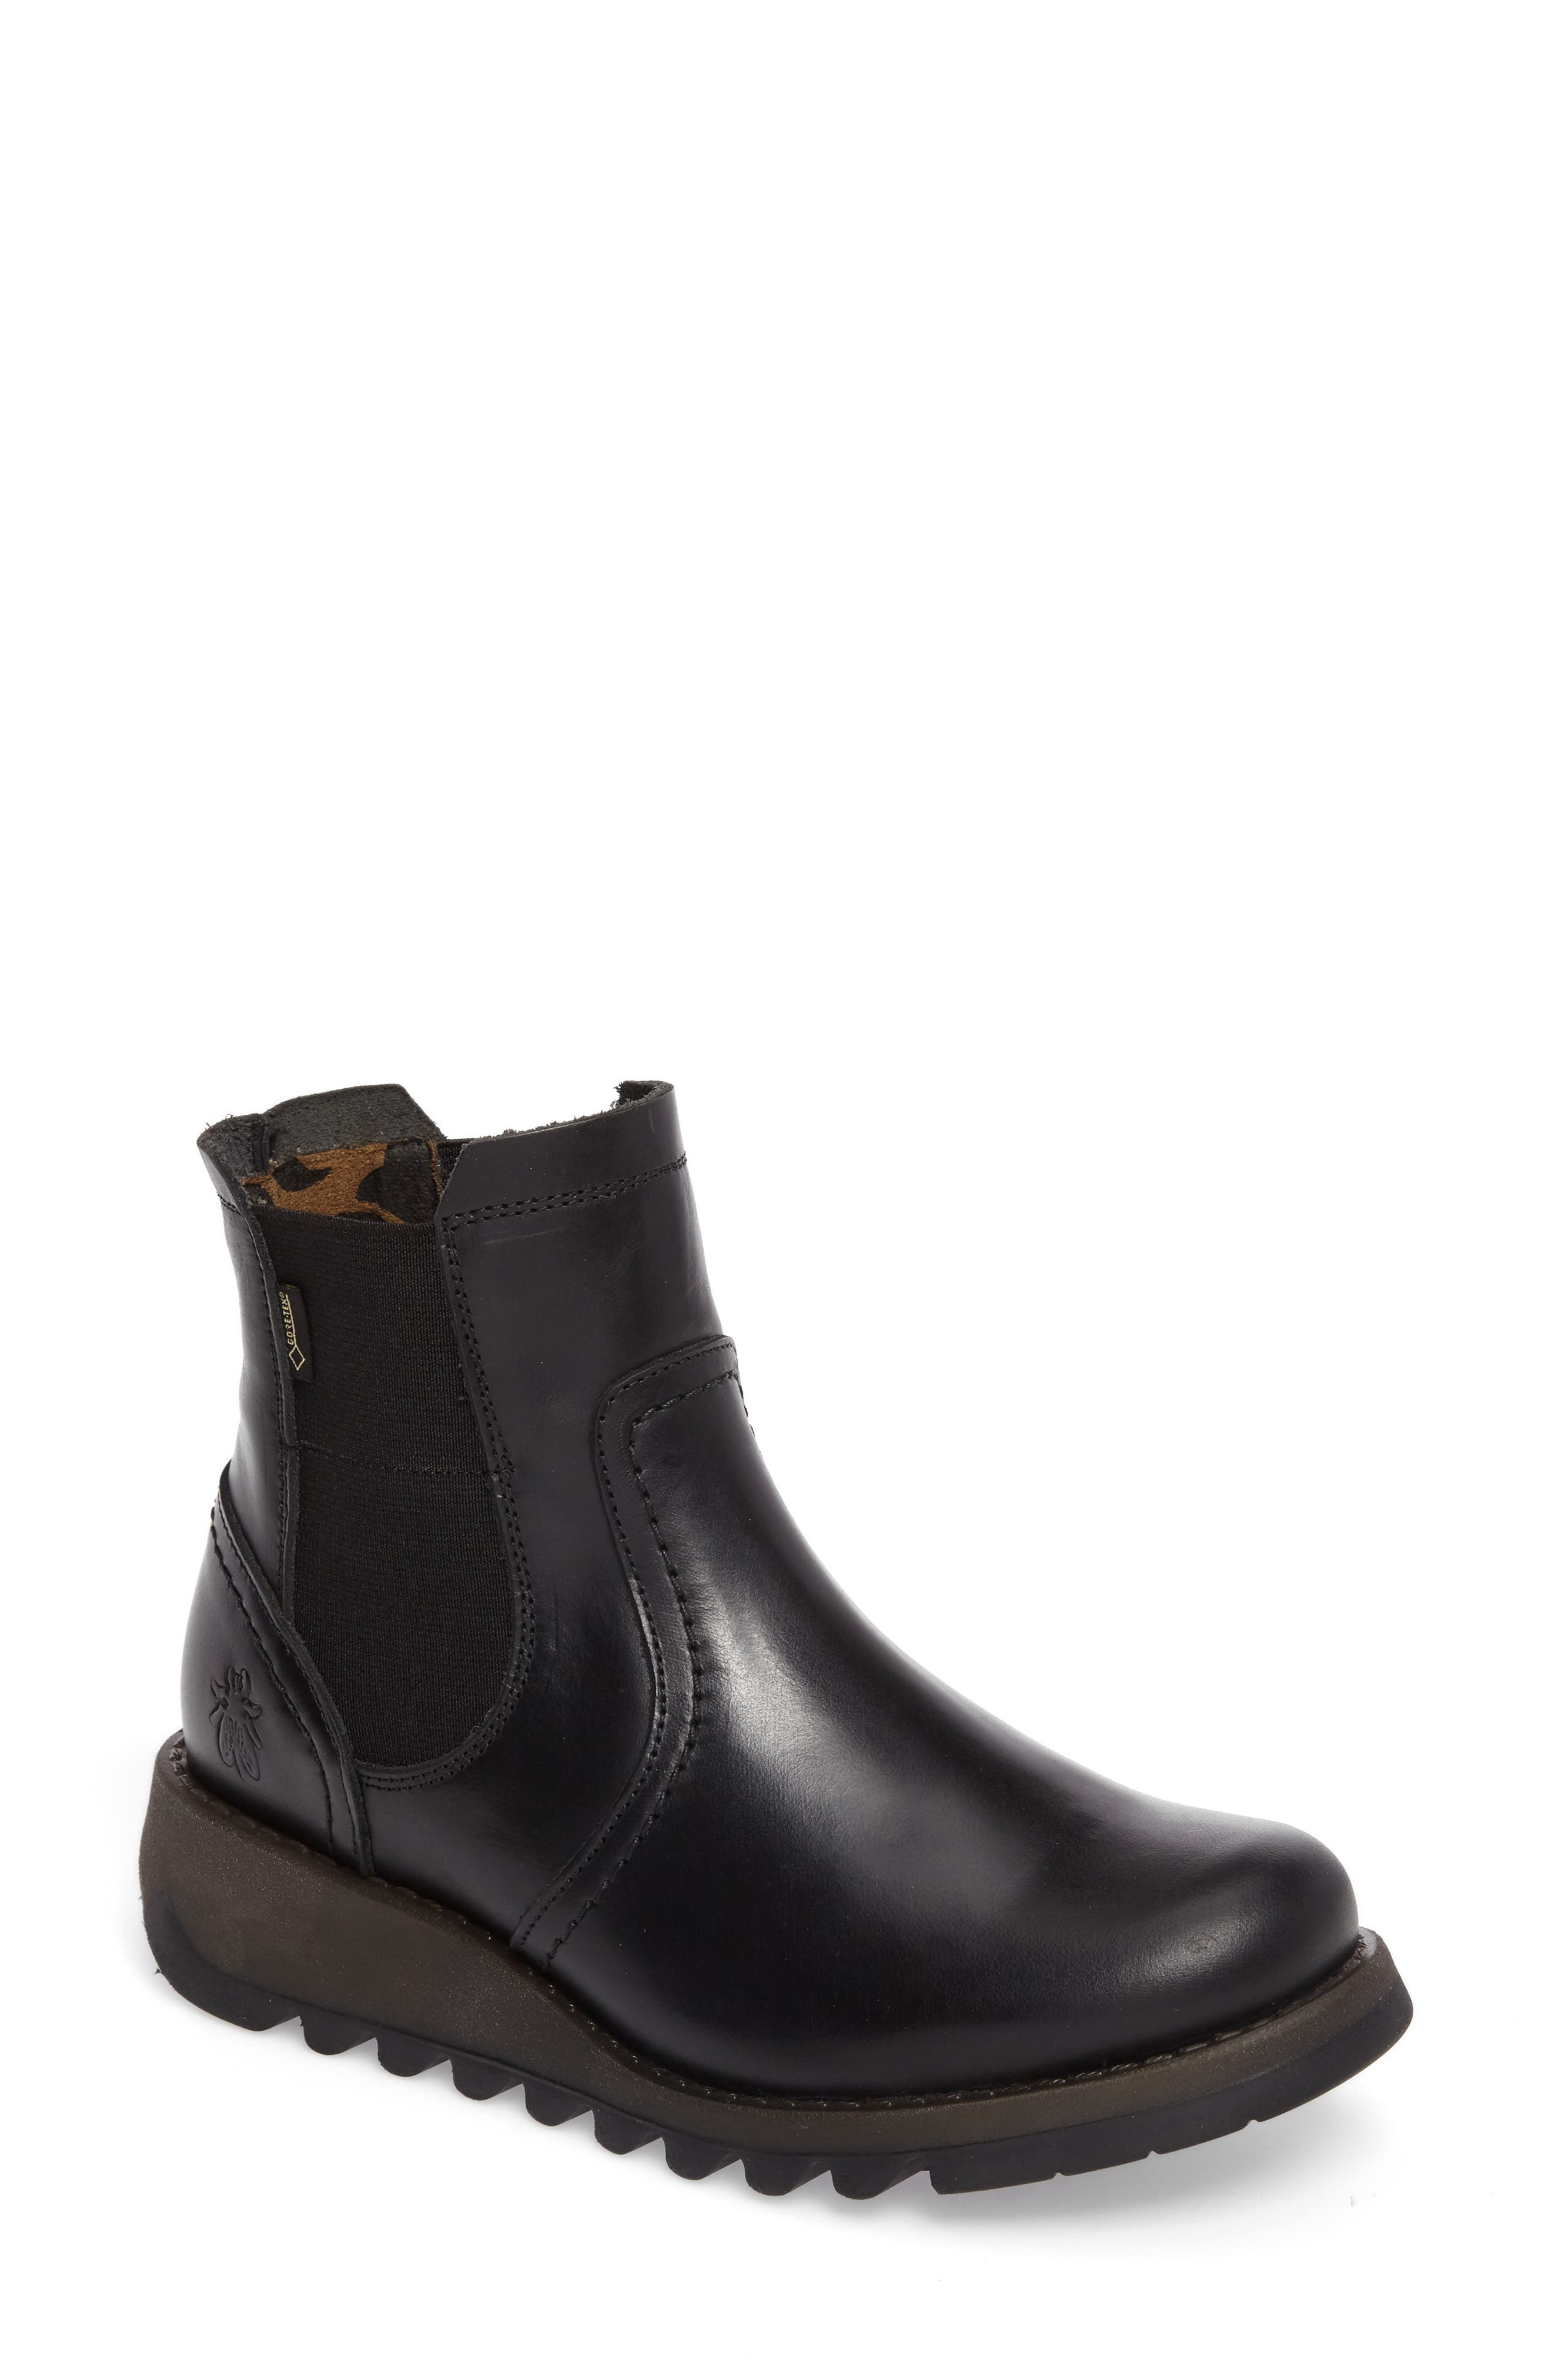 Alternate Image 1 Selected - Fly London Scon Waterproof Gore-Tex® Chelsea Boot (Women)